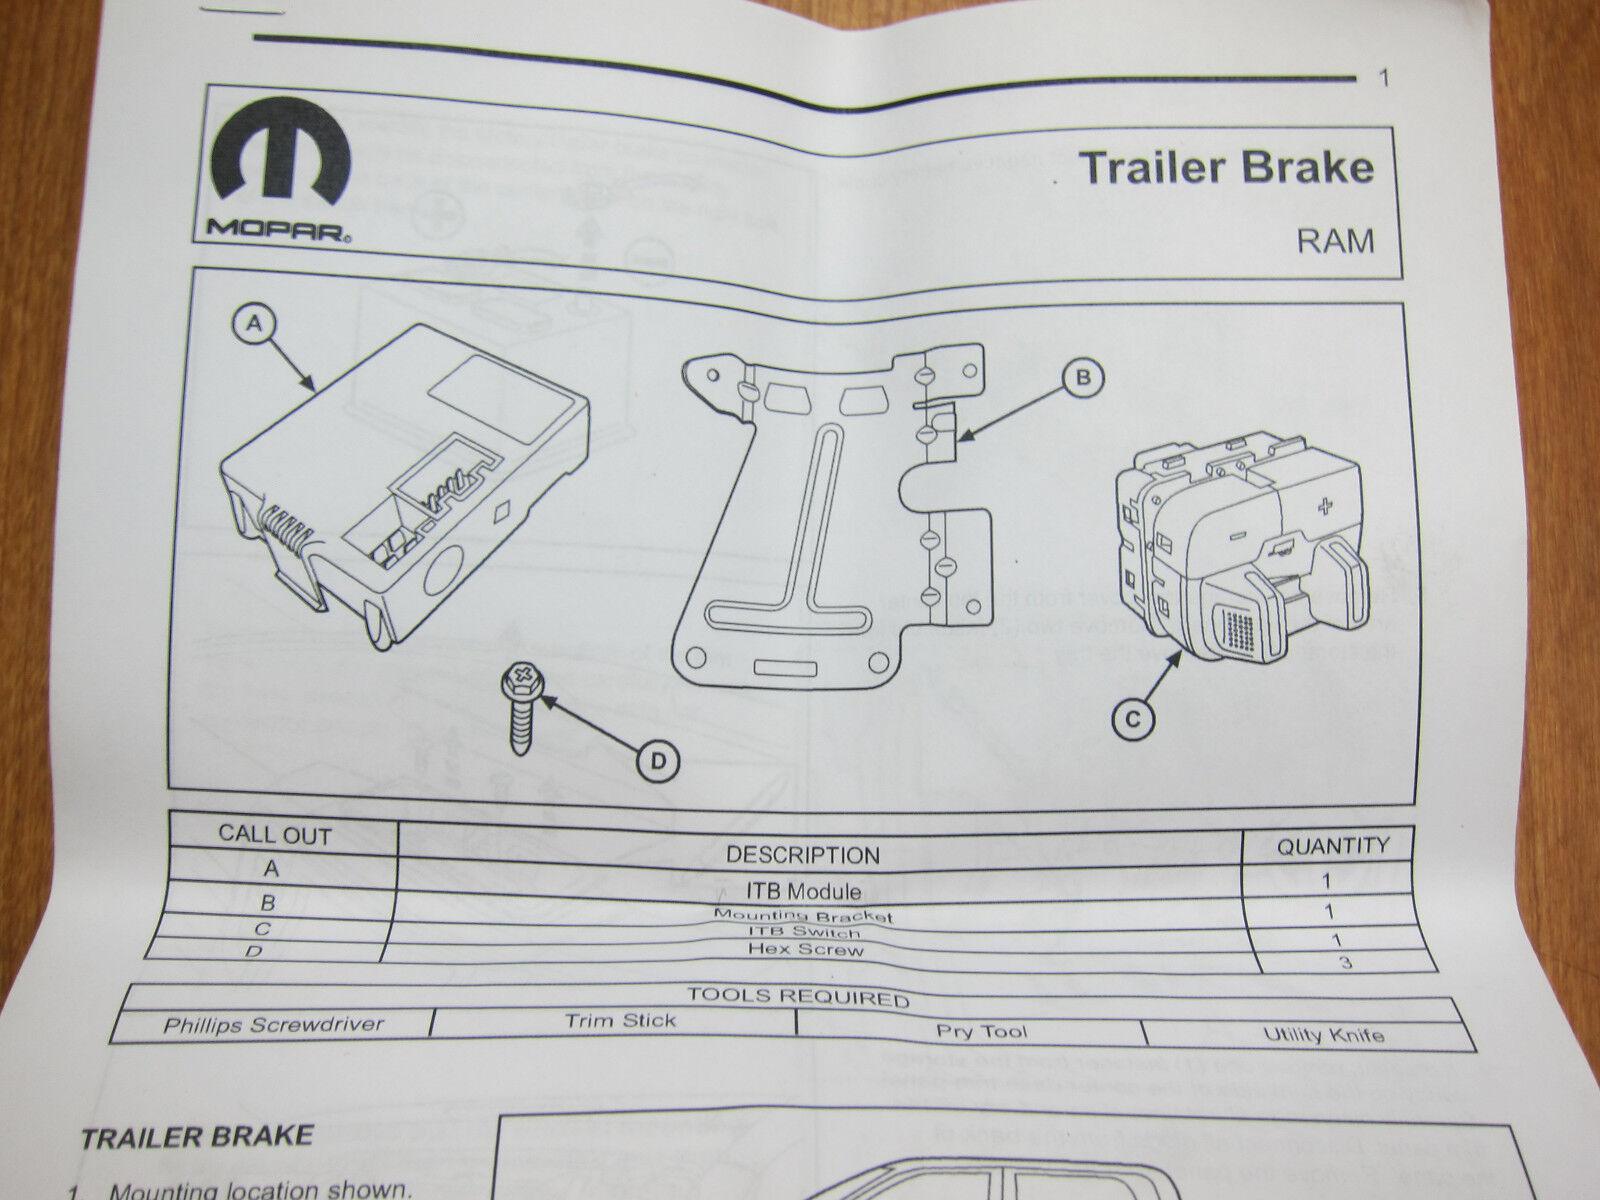 2015 Ram 1500 2500 3500 Integrated Trailer Brake Controller Mopar Oem Wiring Harness